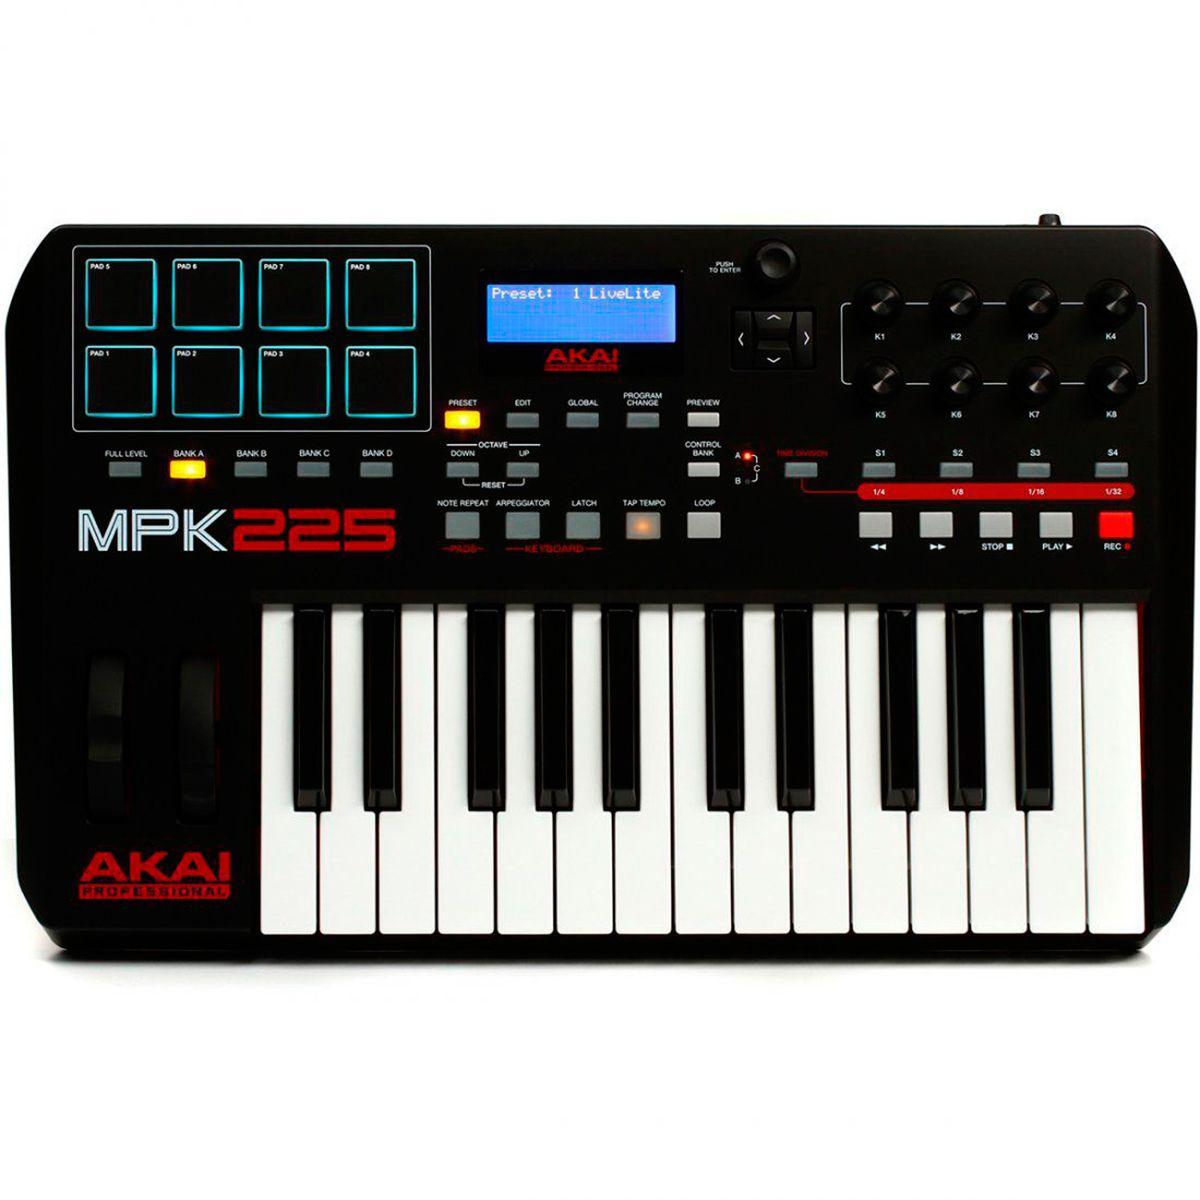 Teclado Controlador Akai Professional MPK225 USB 25 Teclas